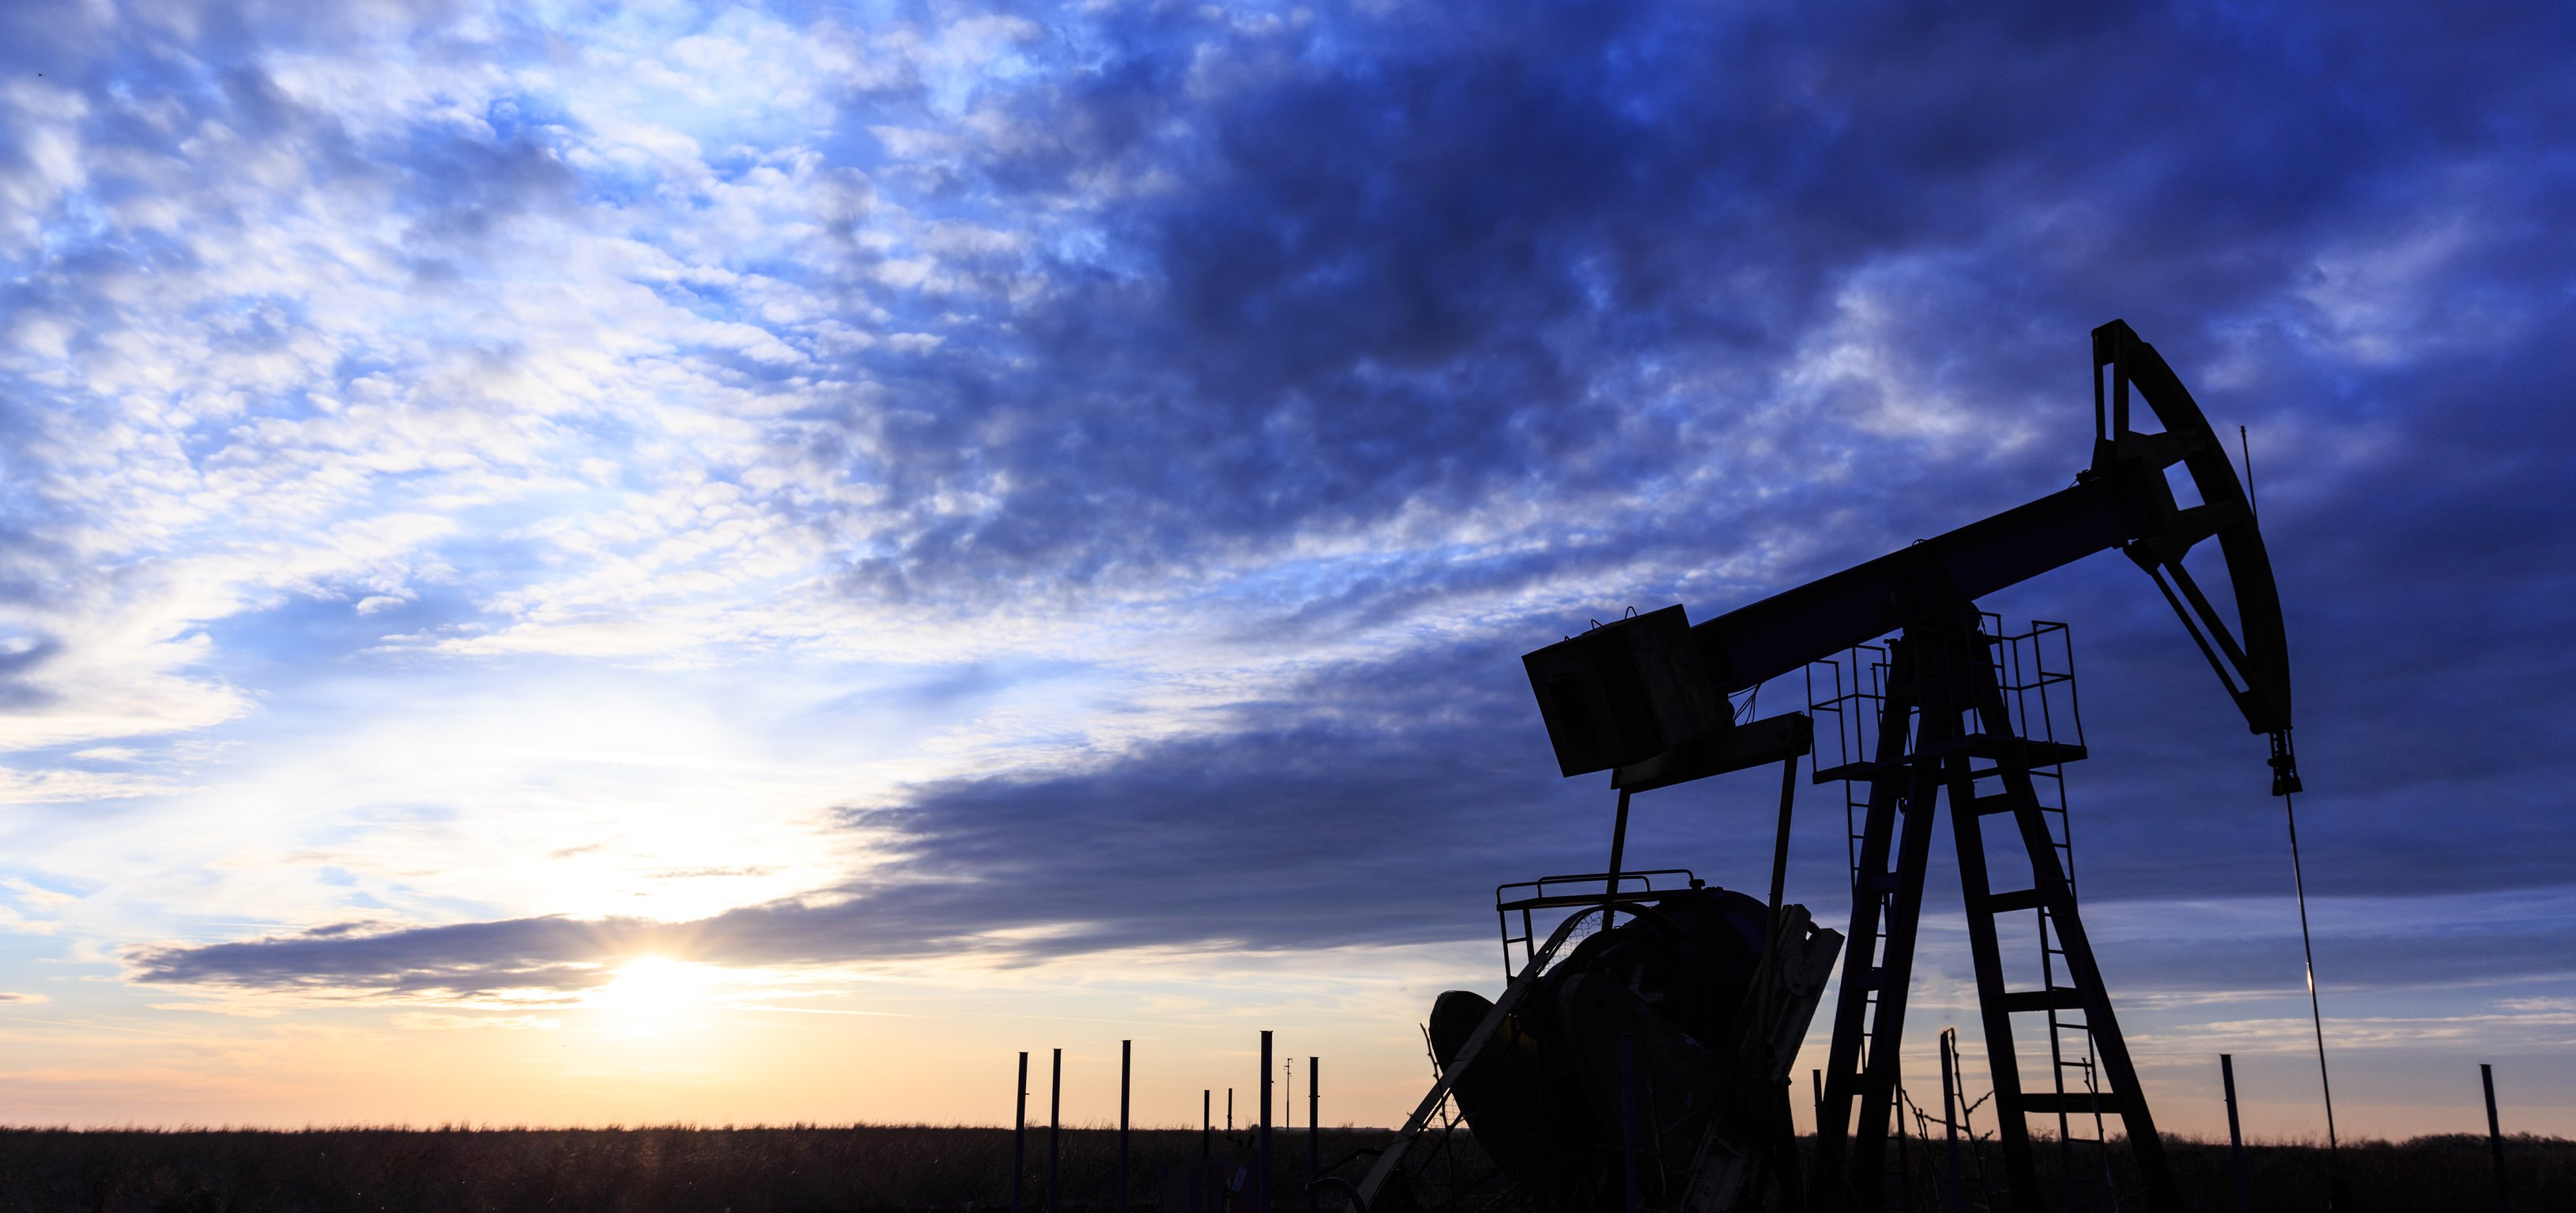 Onsite Oilfield & Refinery Safety Training: SafeLand, Aware